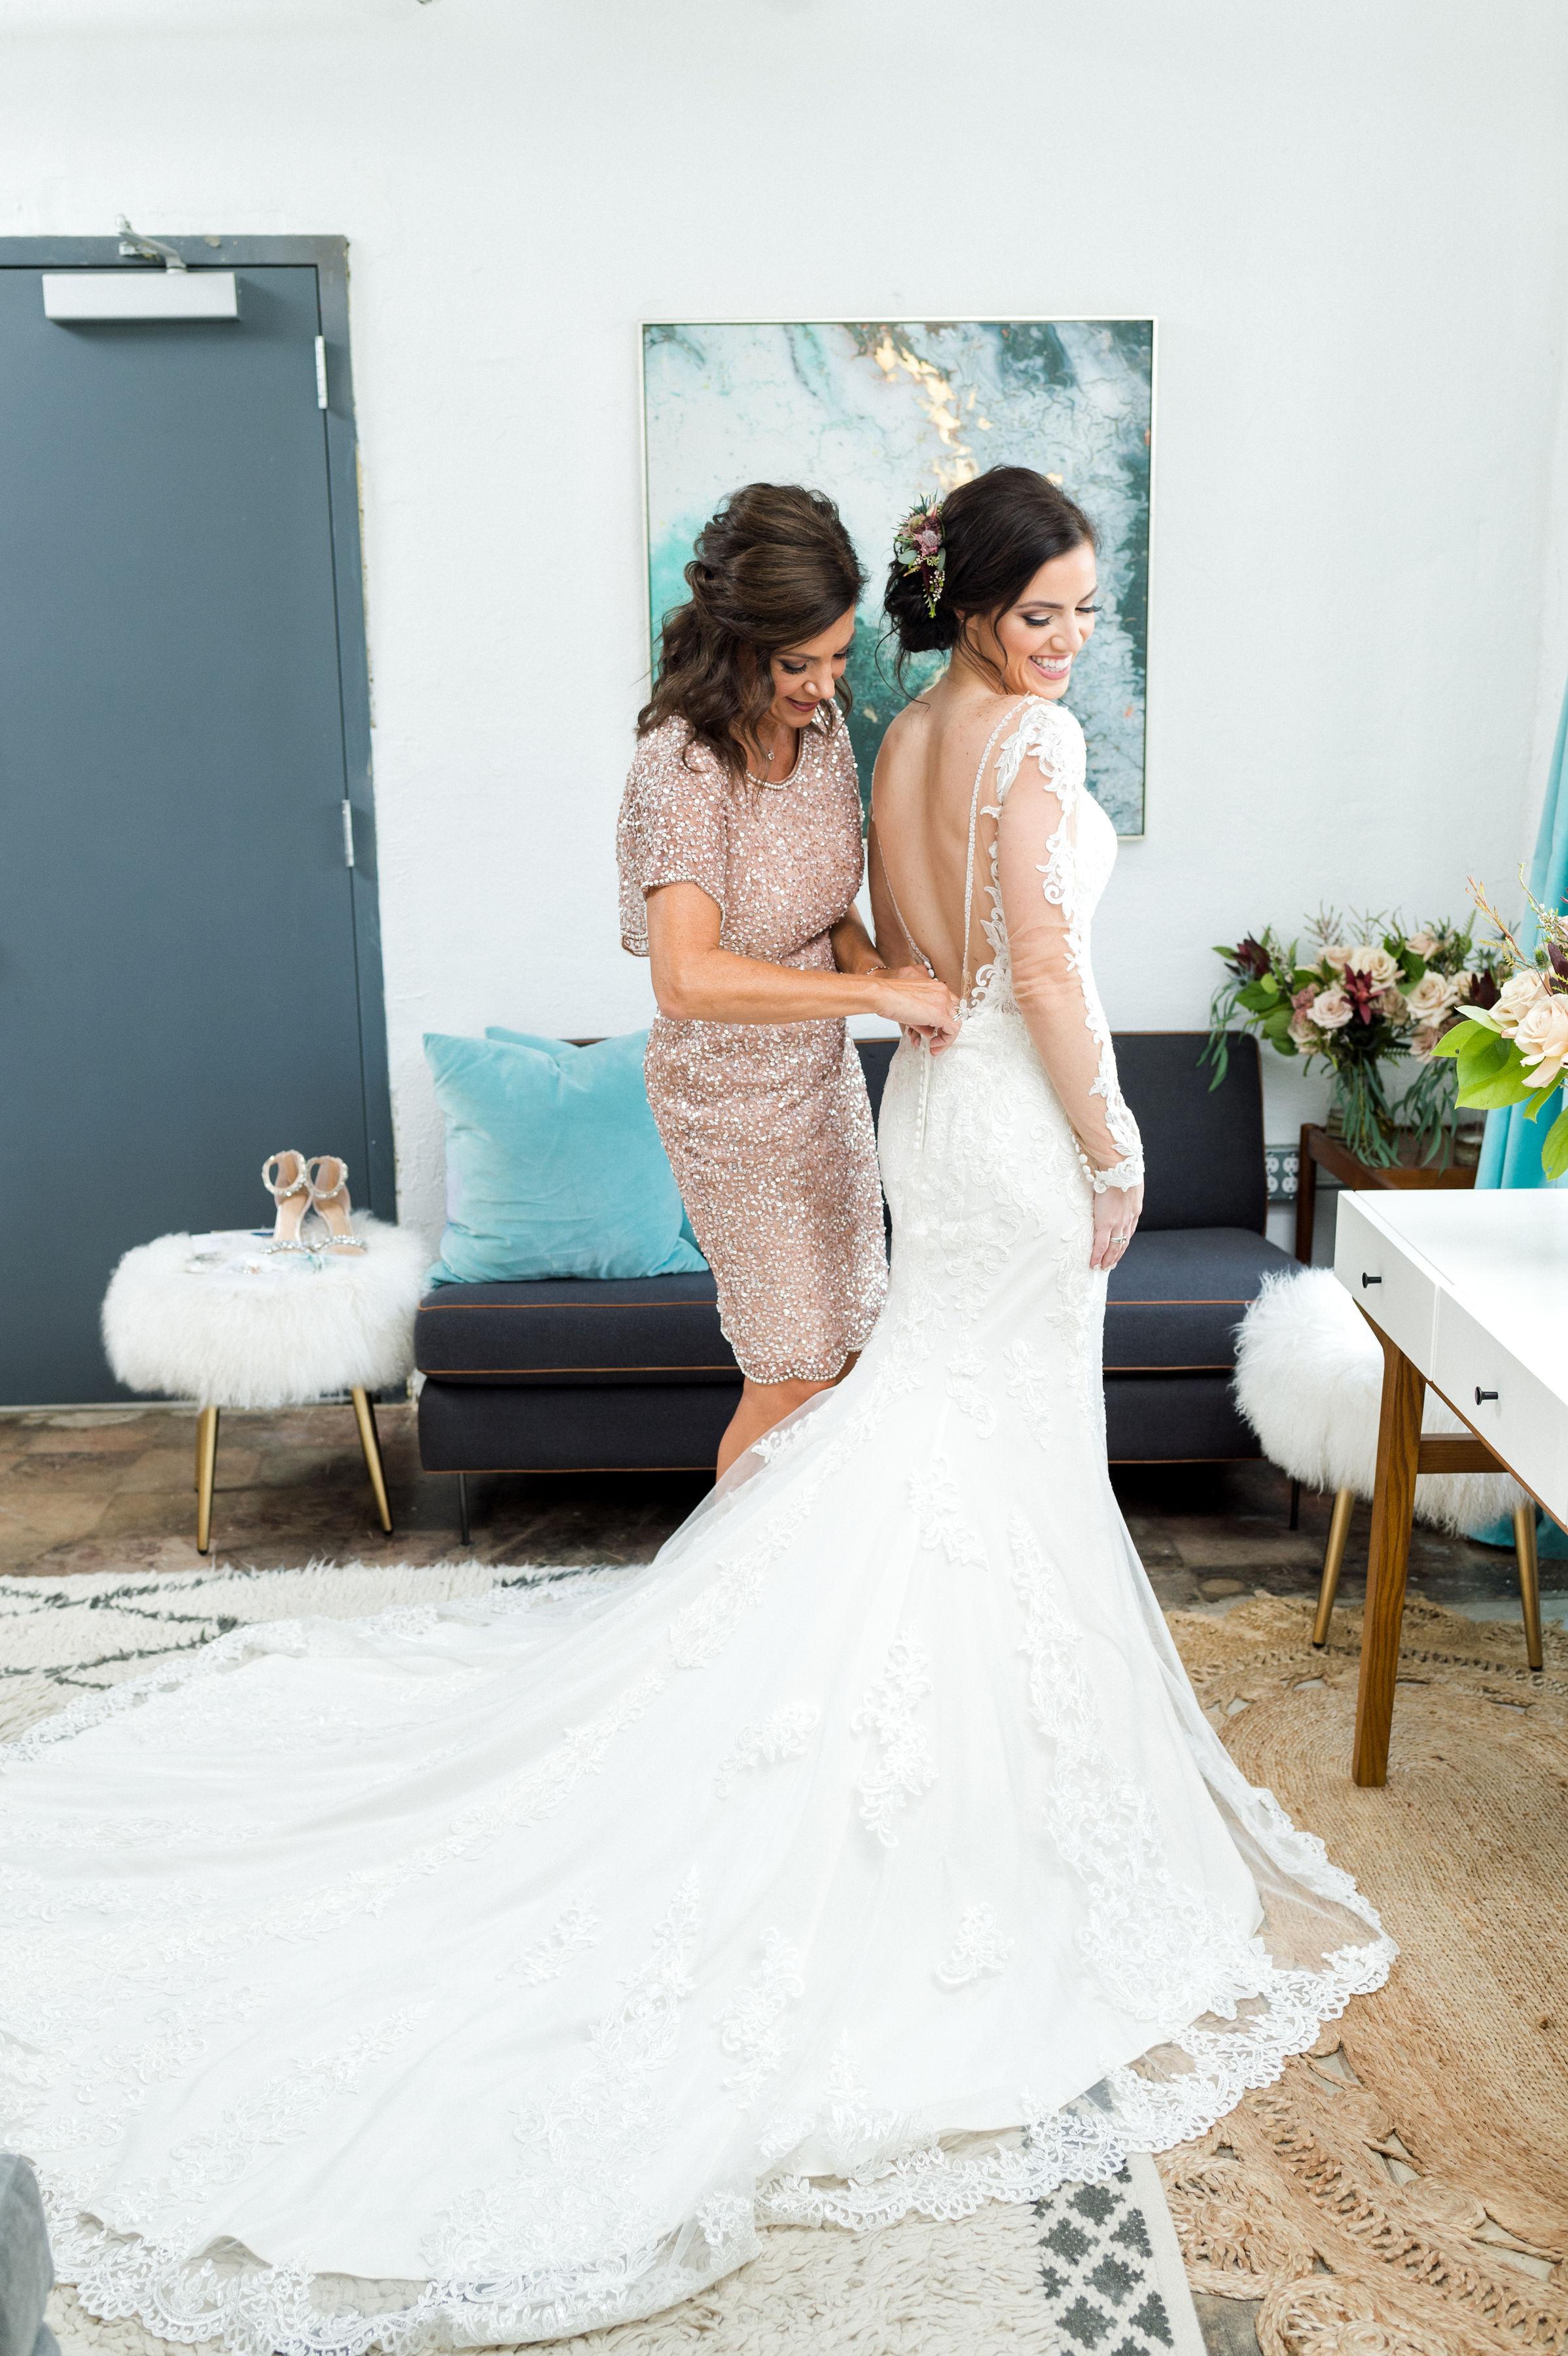 Fall Wedding Dress Inspiration | Downtown Fort Worth Industrial Modern Wedding Design